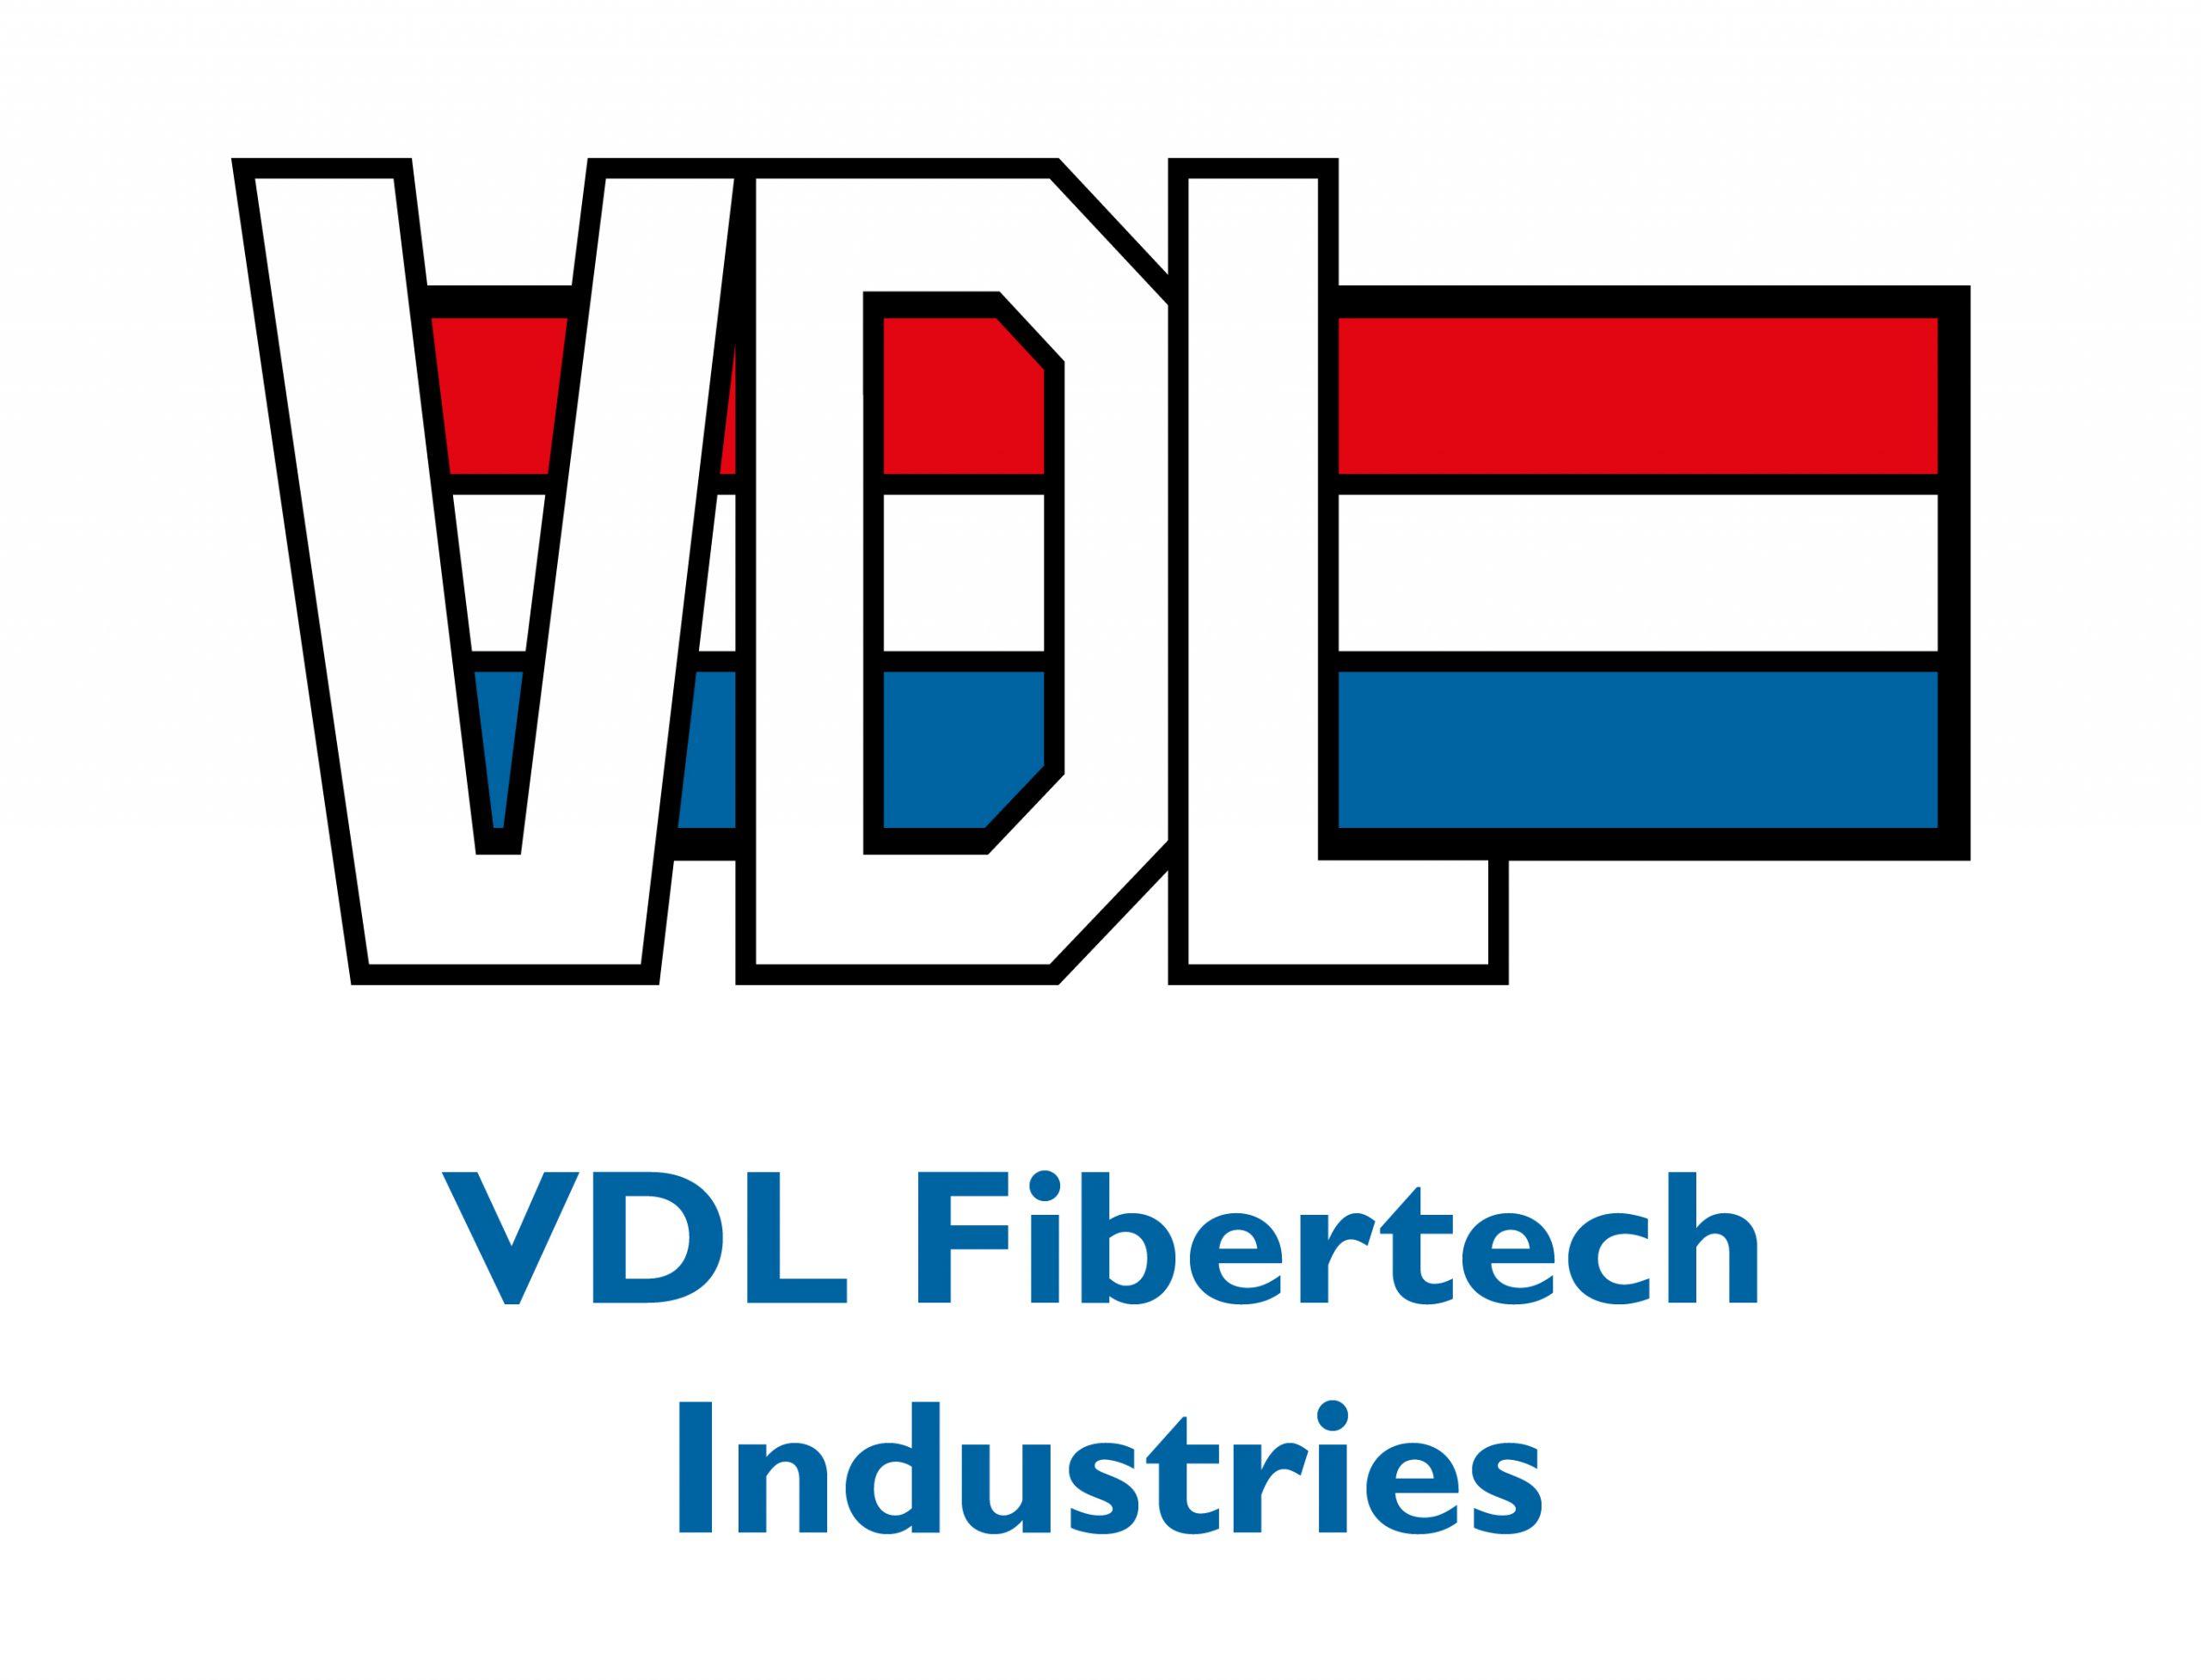 VDL Fibertech Industries BV logo